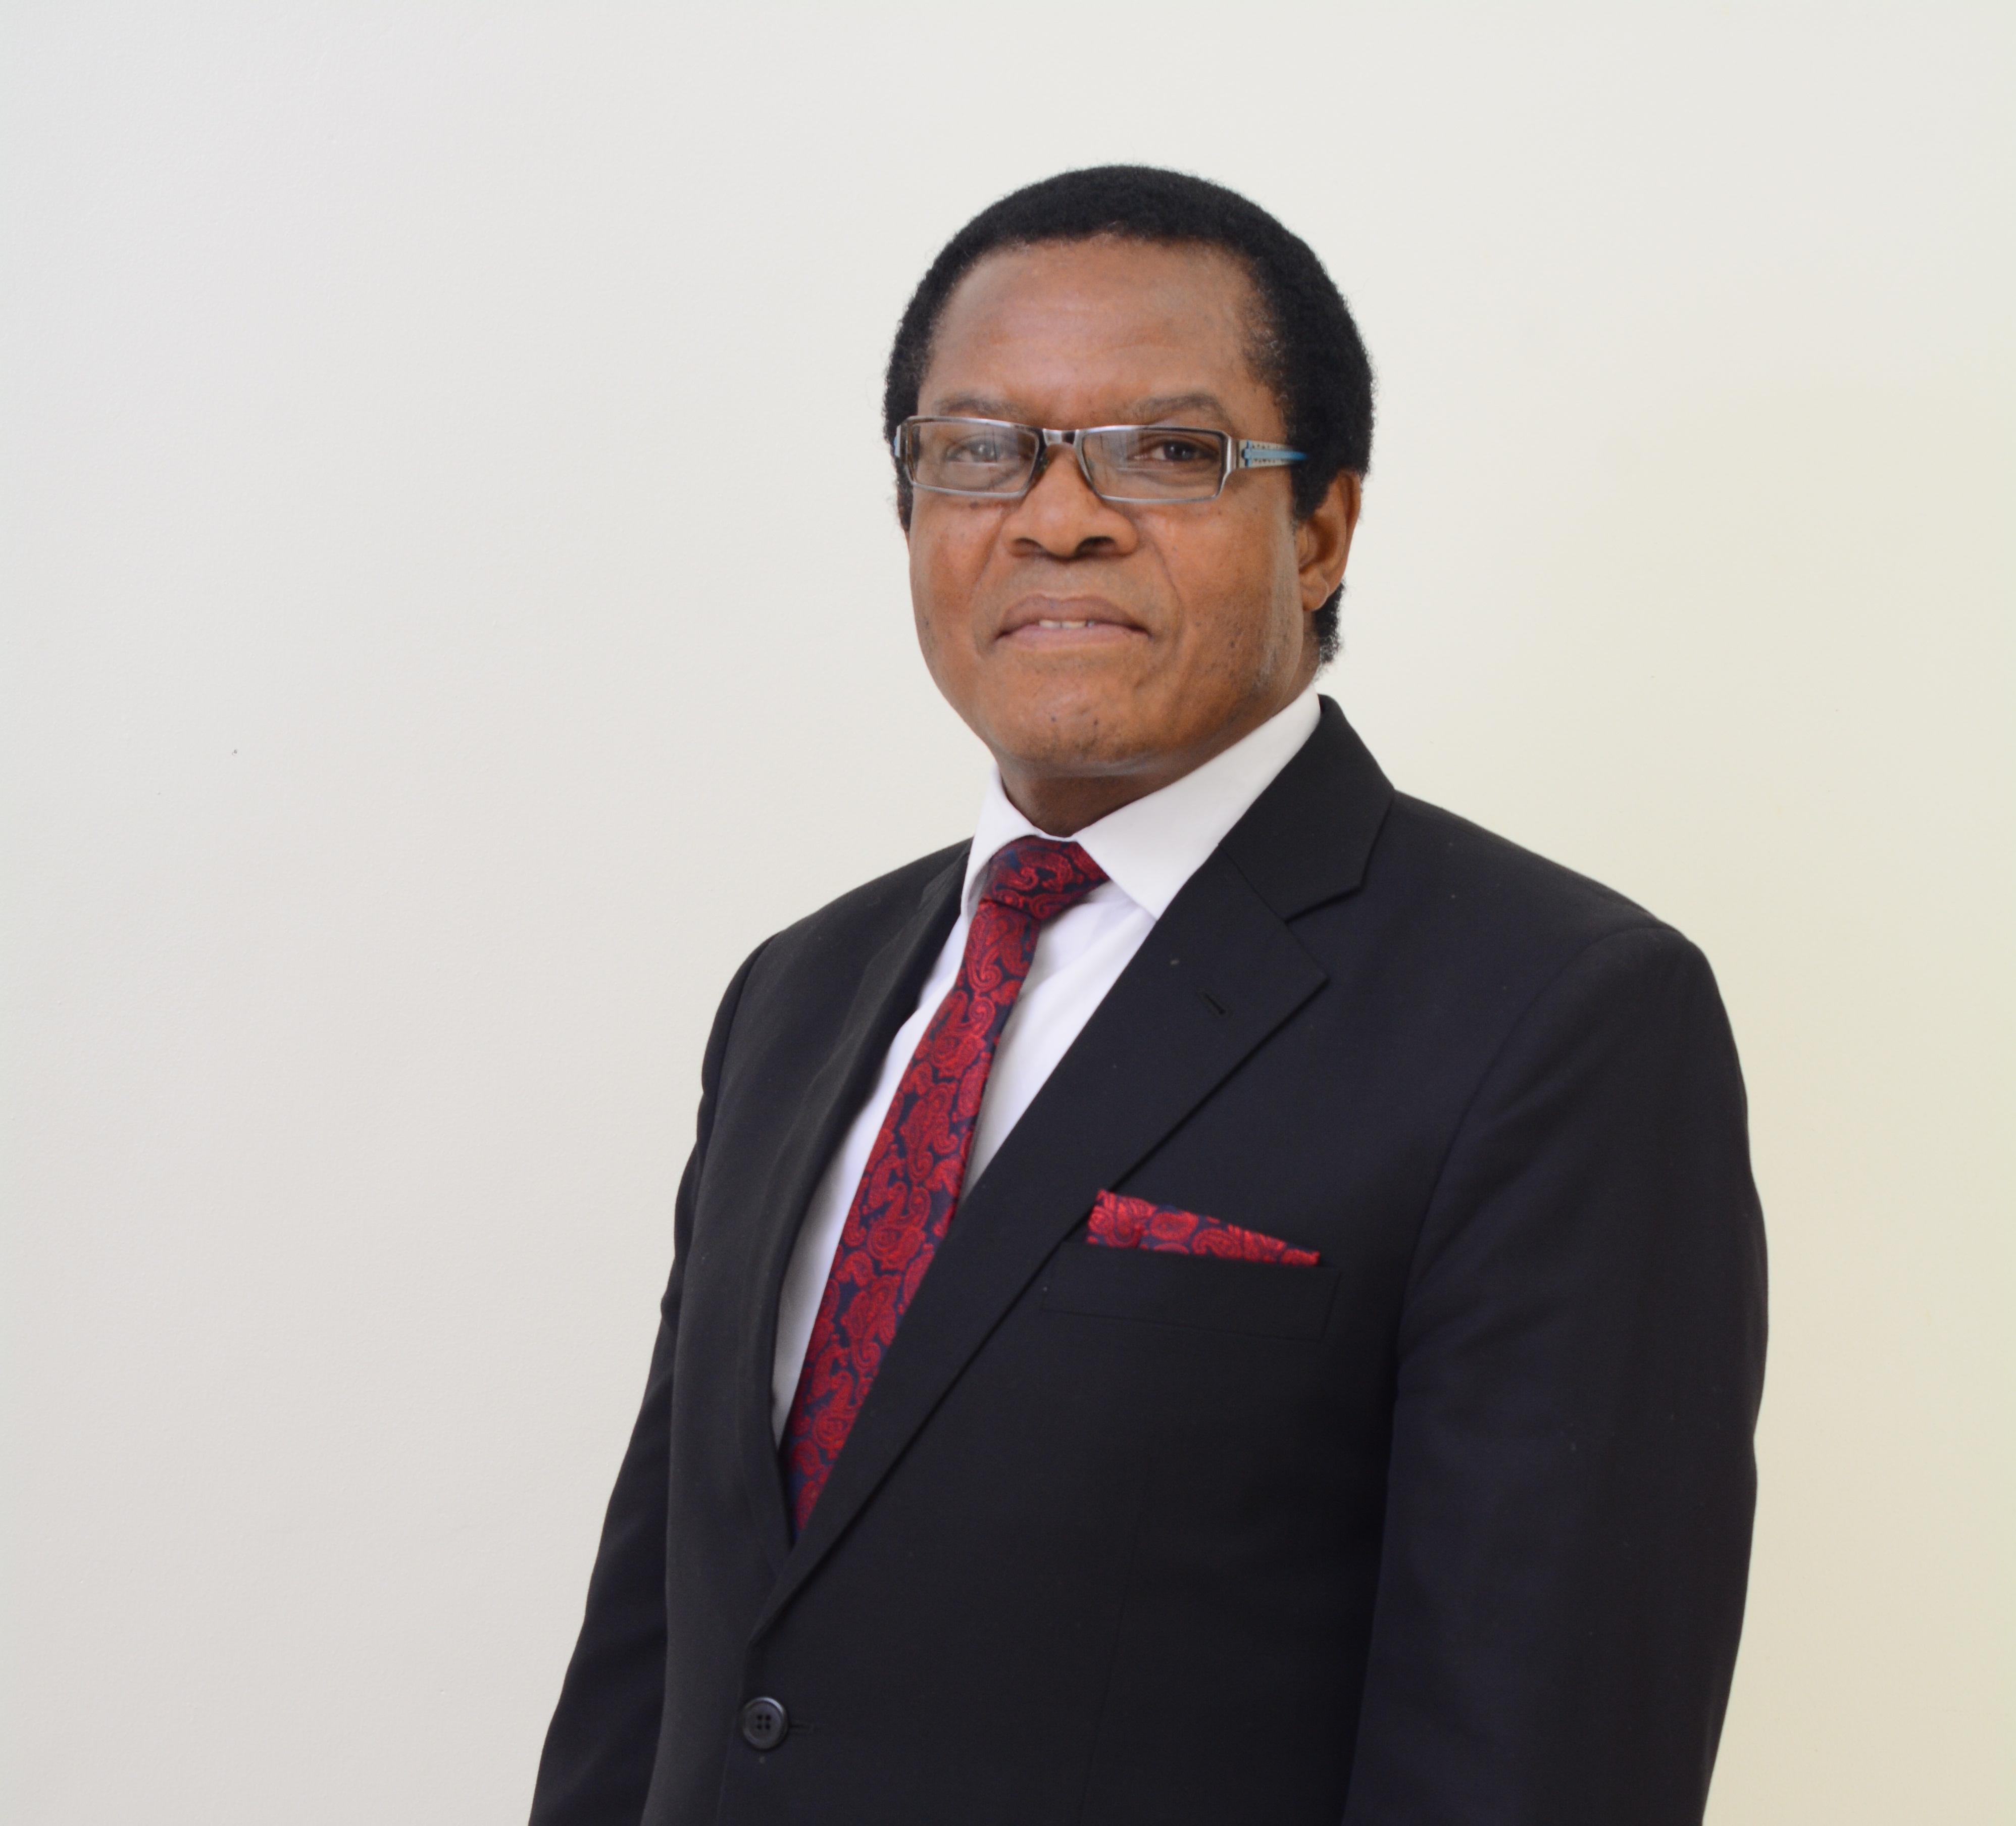 Dr. Gift Kallisto Machengete